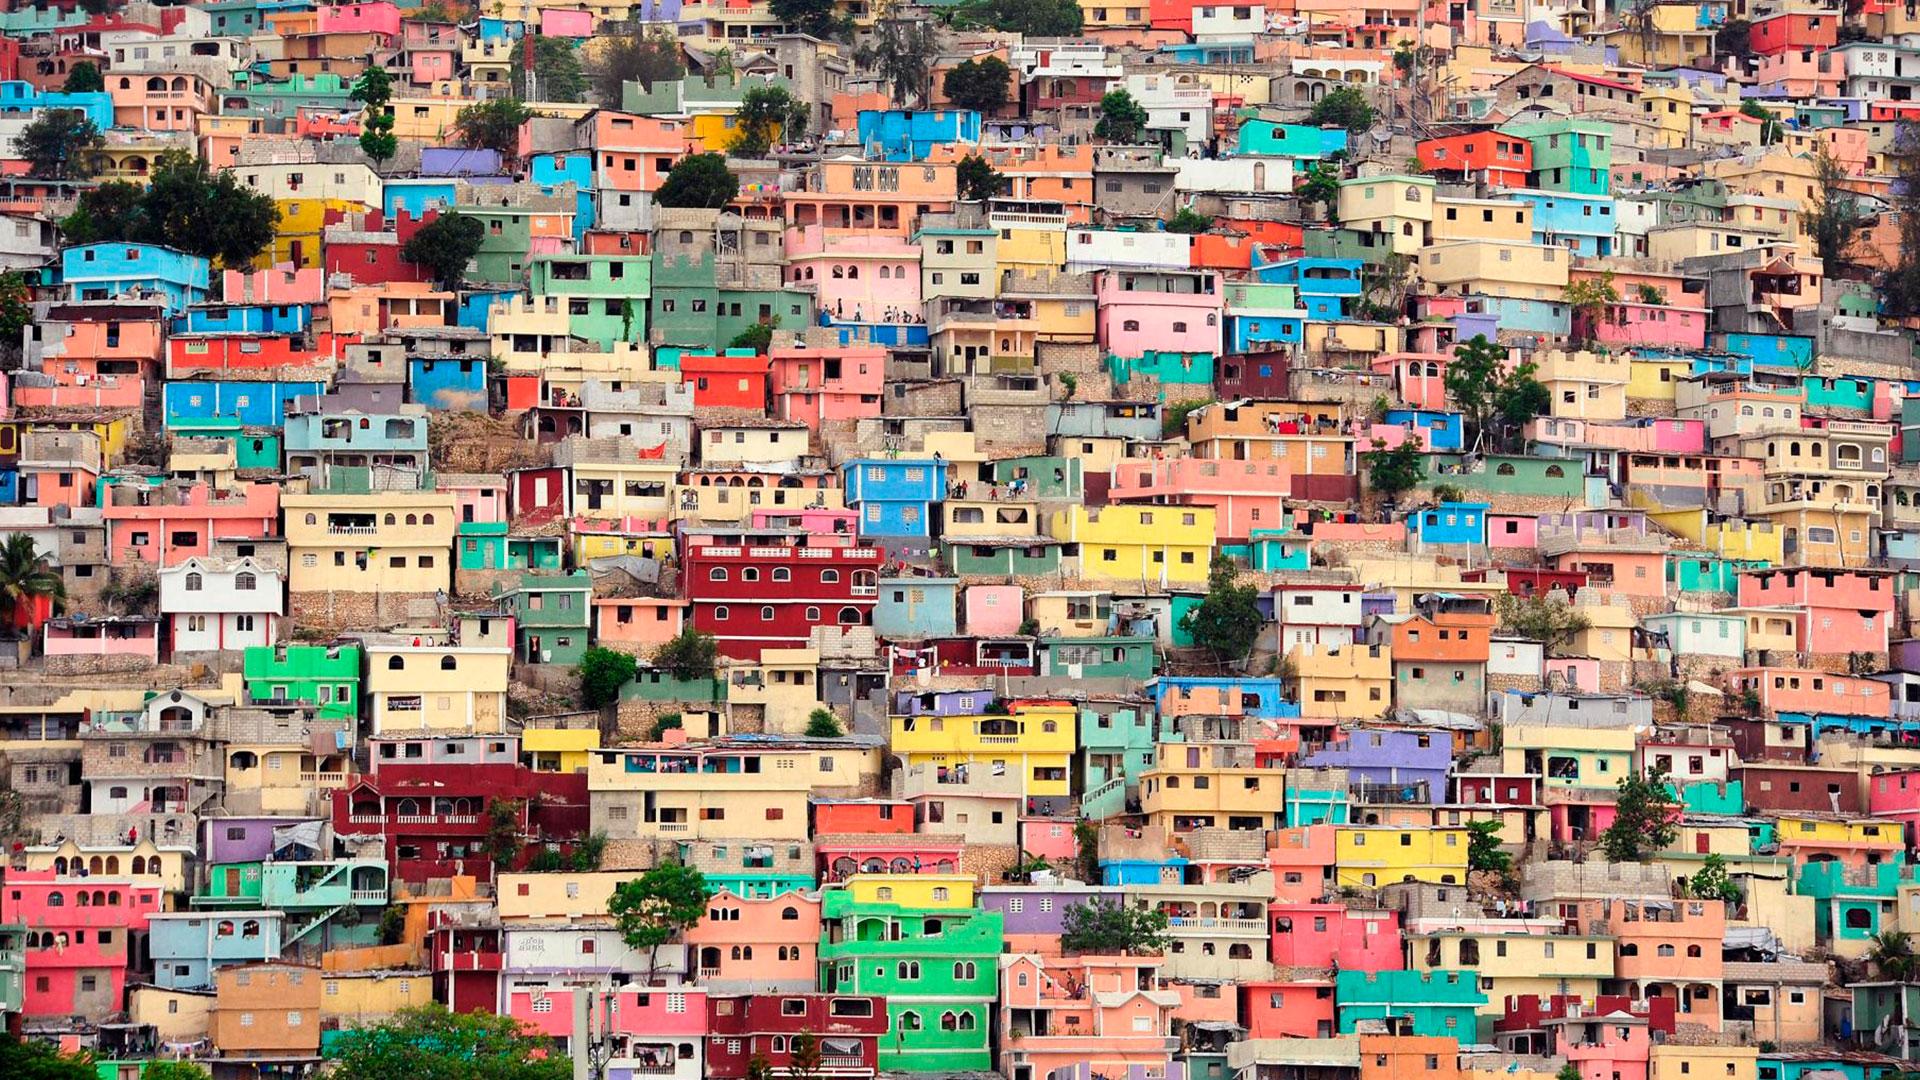 Próximo Haití hero asset